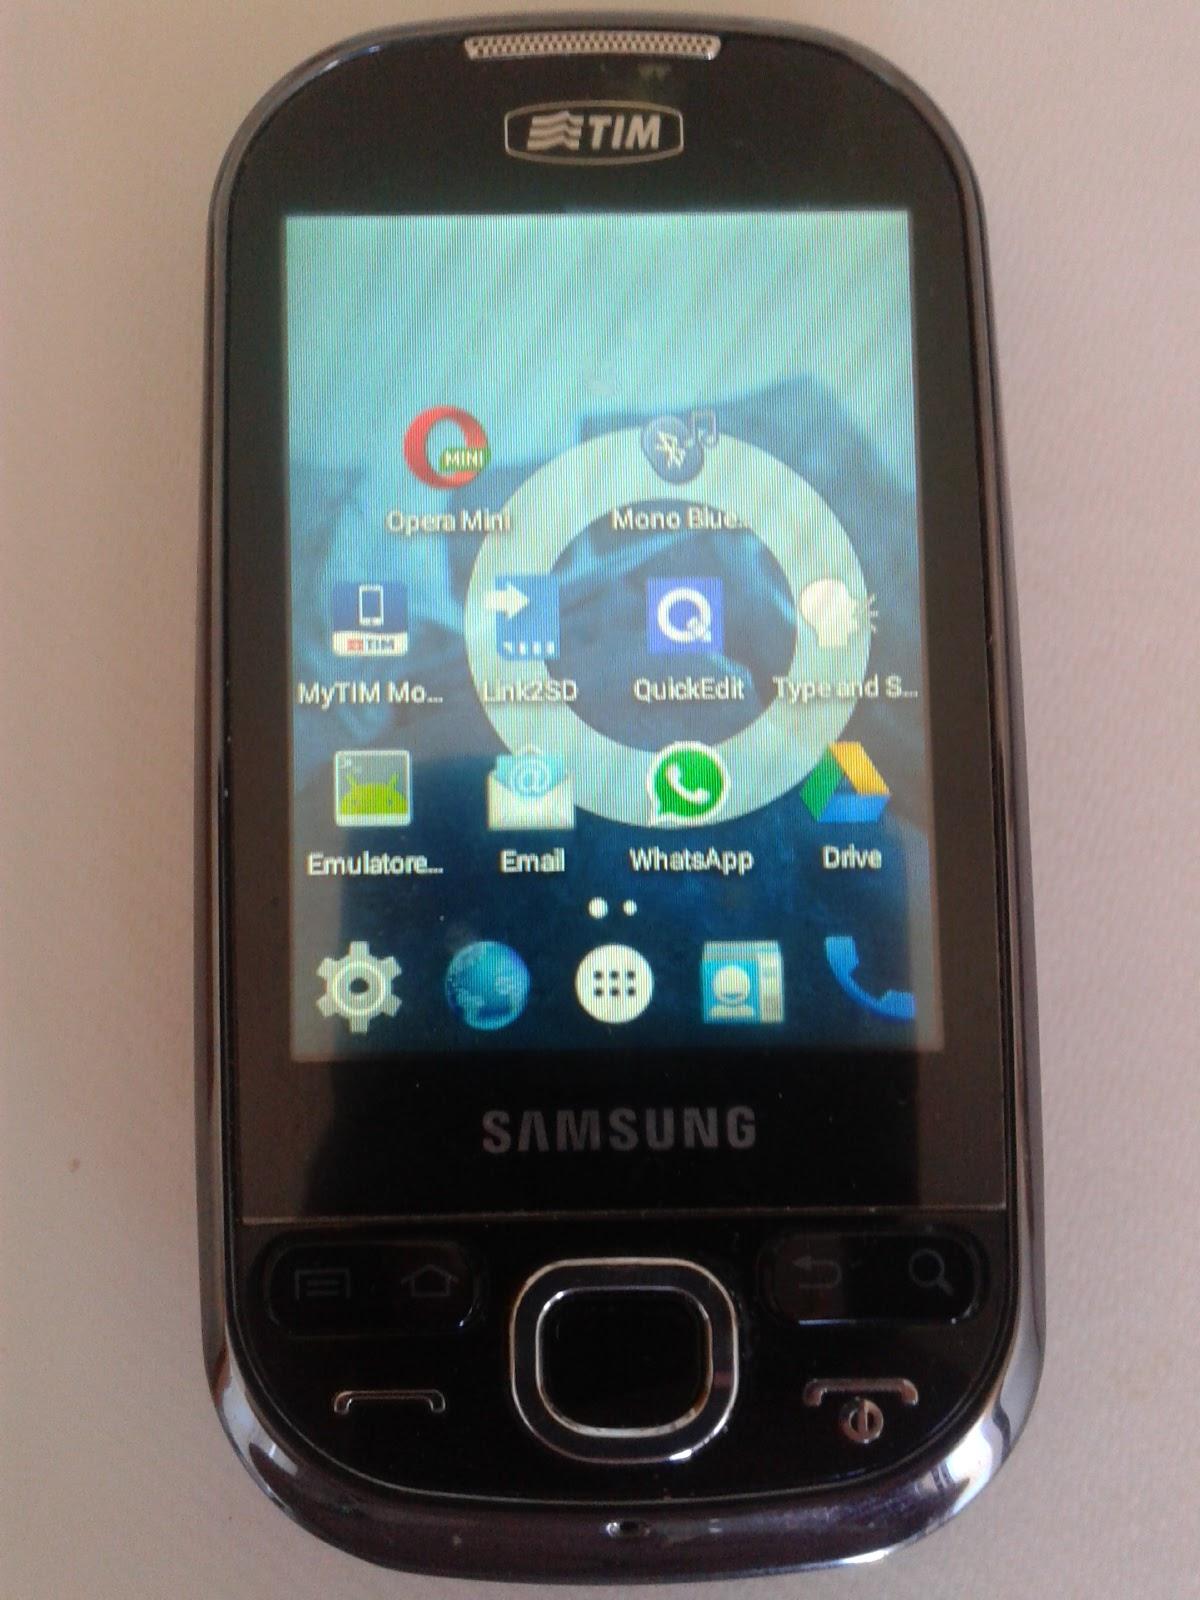 giochi gratis per cellulare samsung gt-i5500